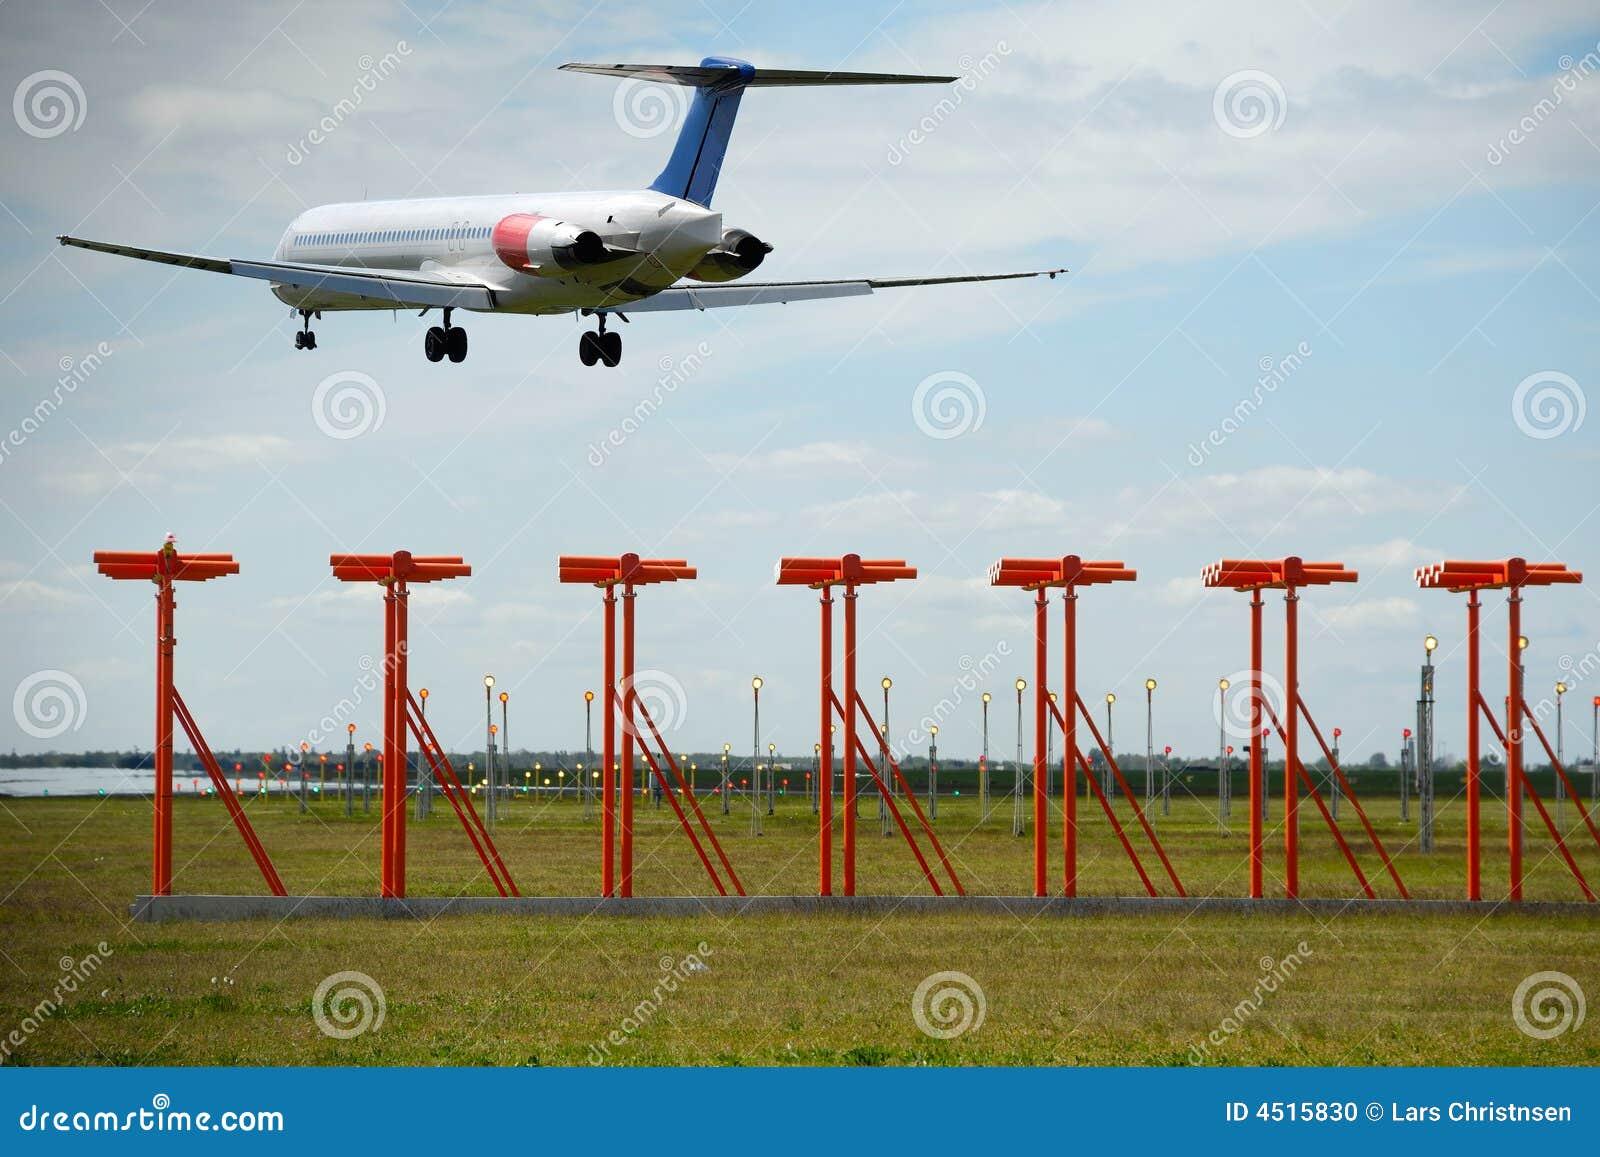 Air airport landing plane travel